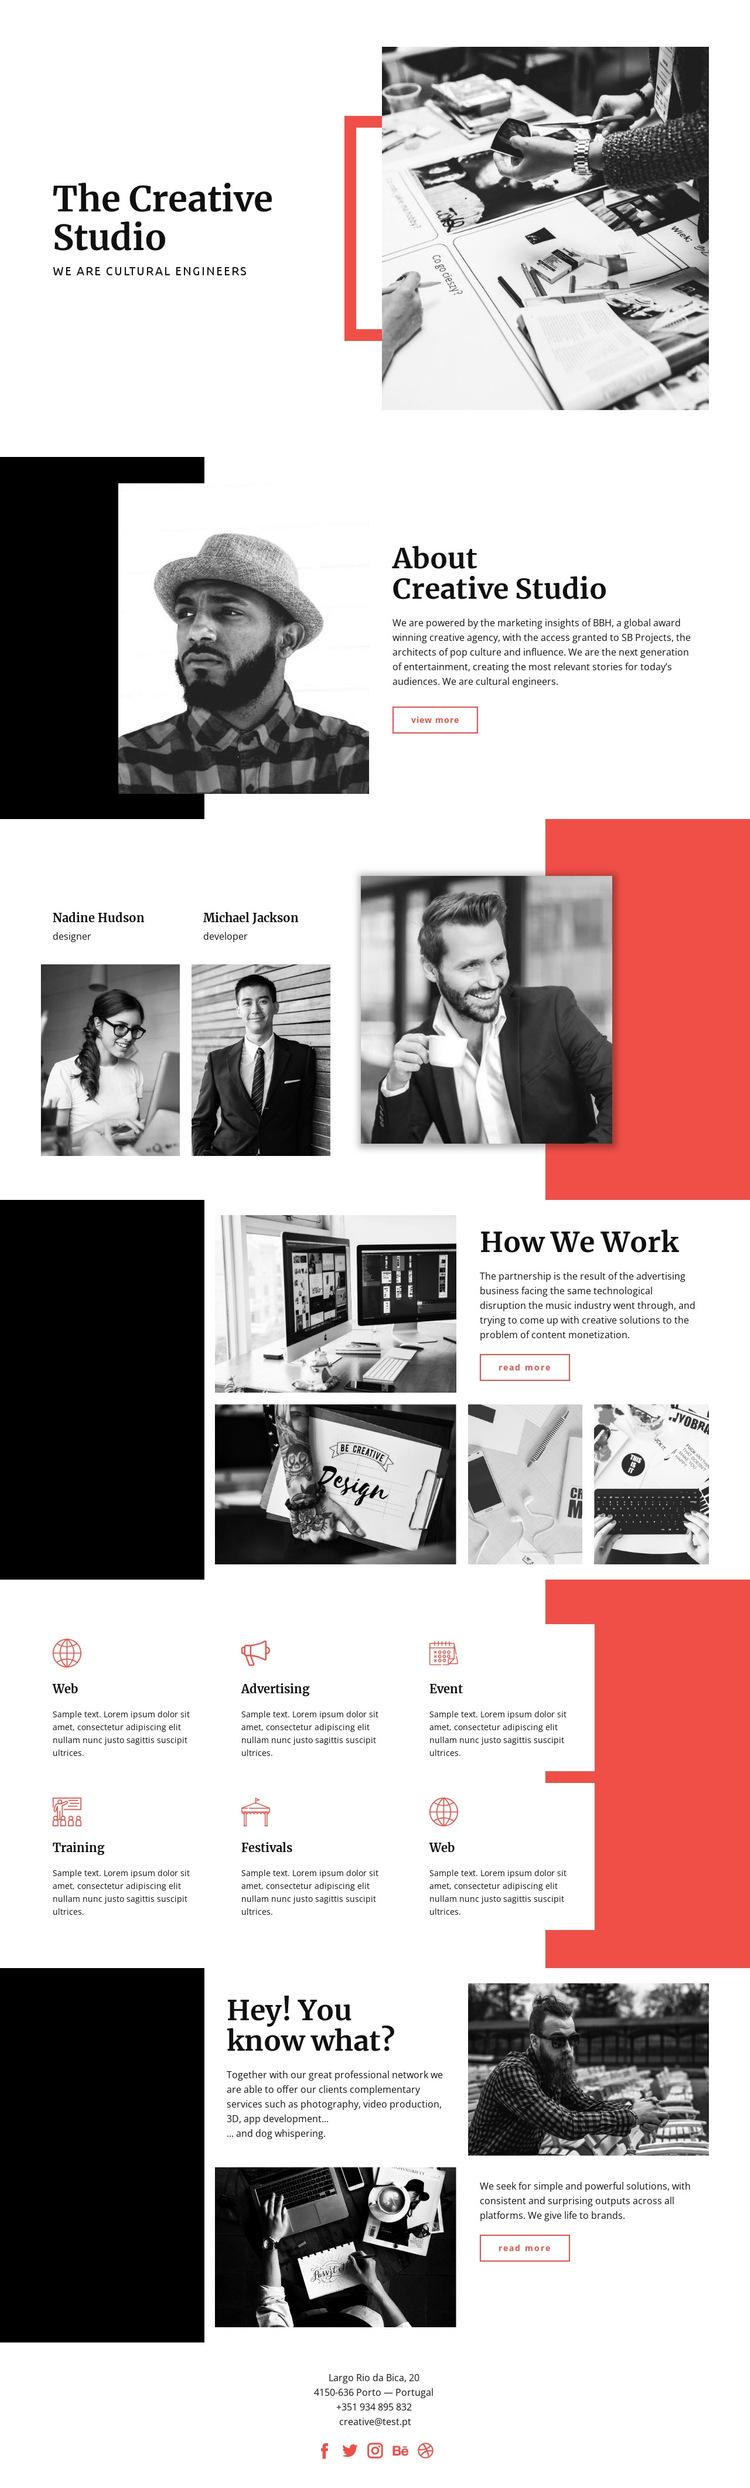 The Creative Studio HTML5 Template